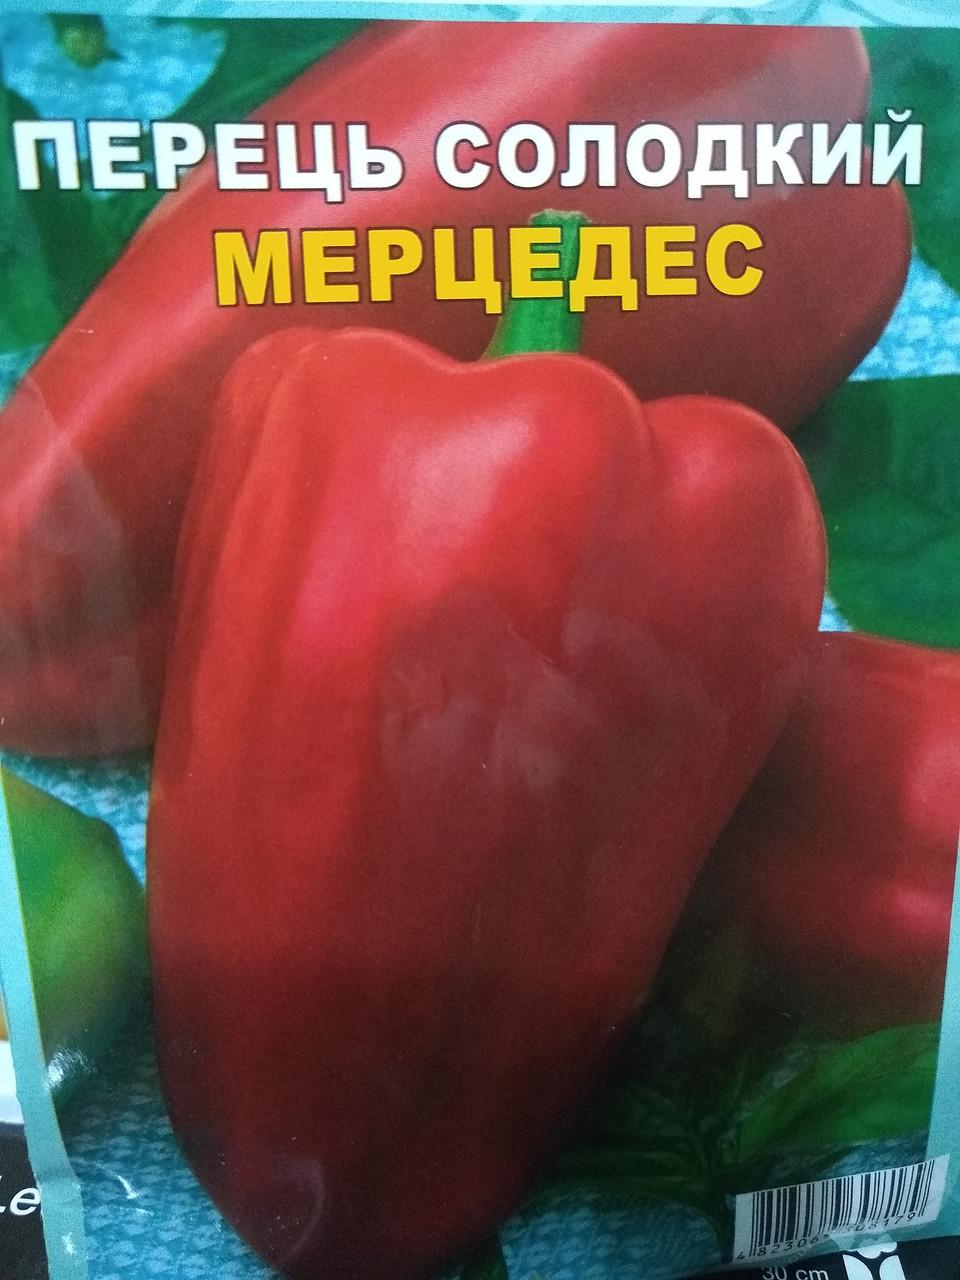 Перец сладкий  Мерцедес сверхранний семена 5 г, Украина